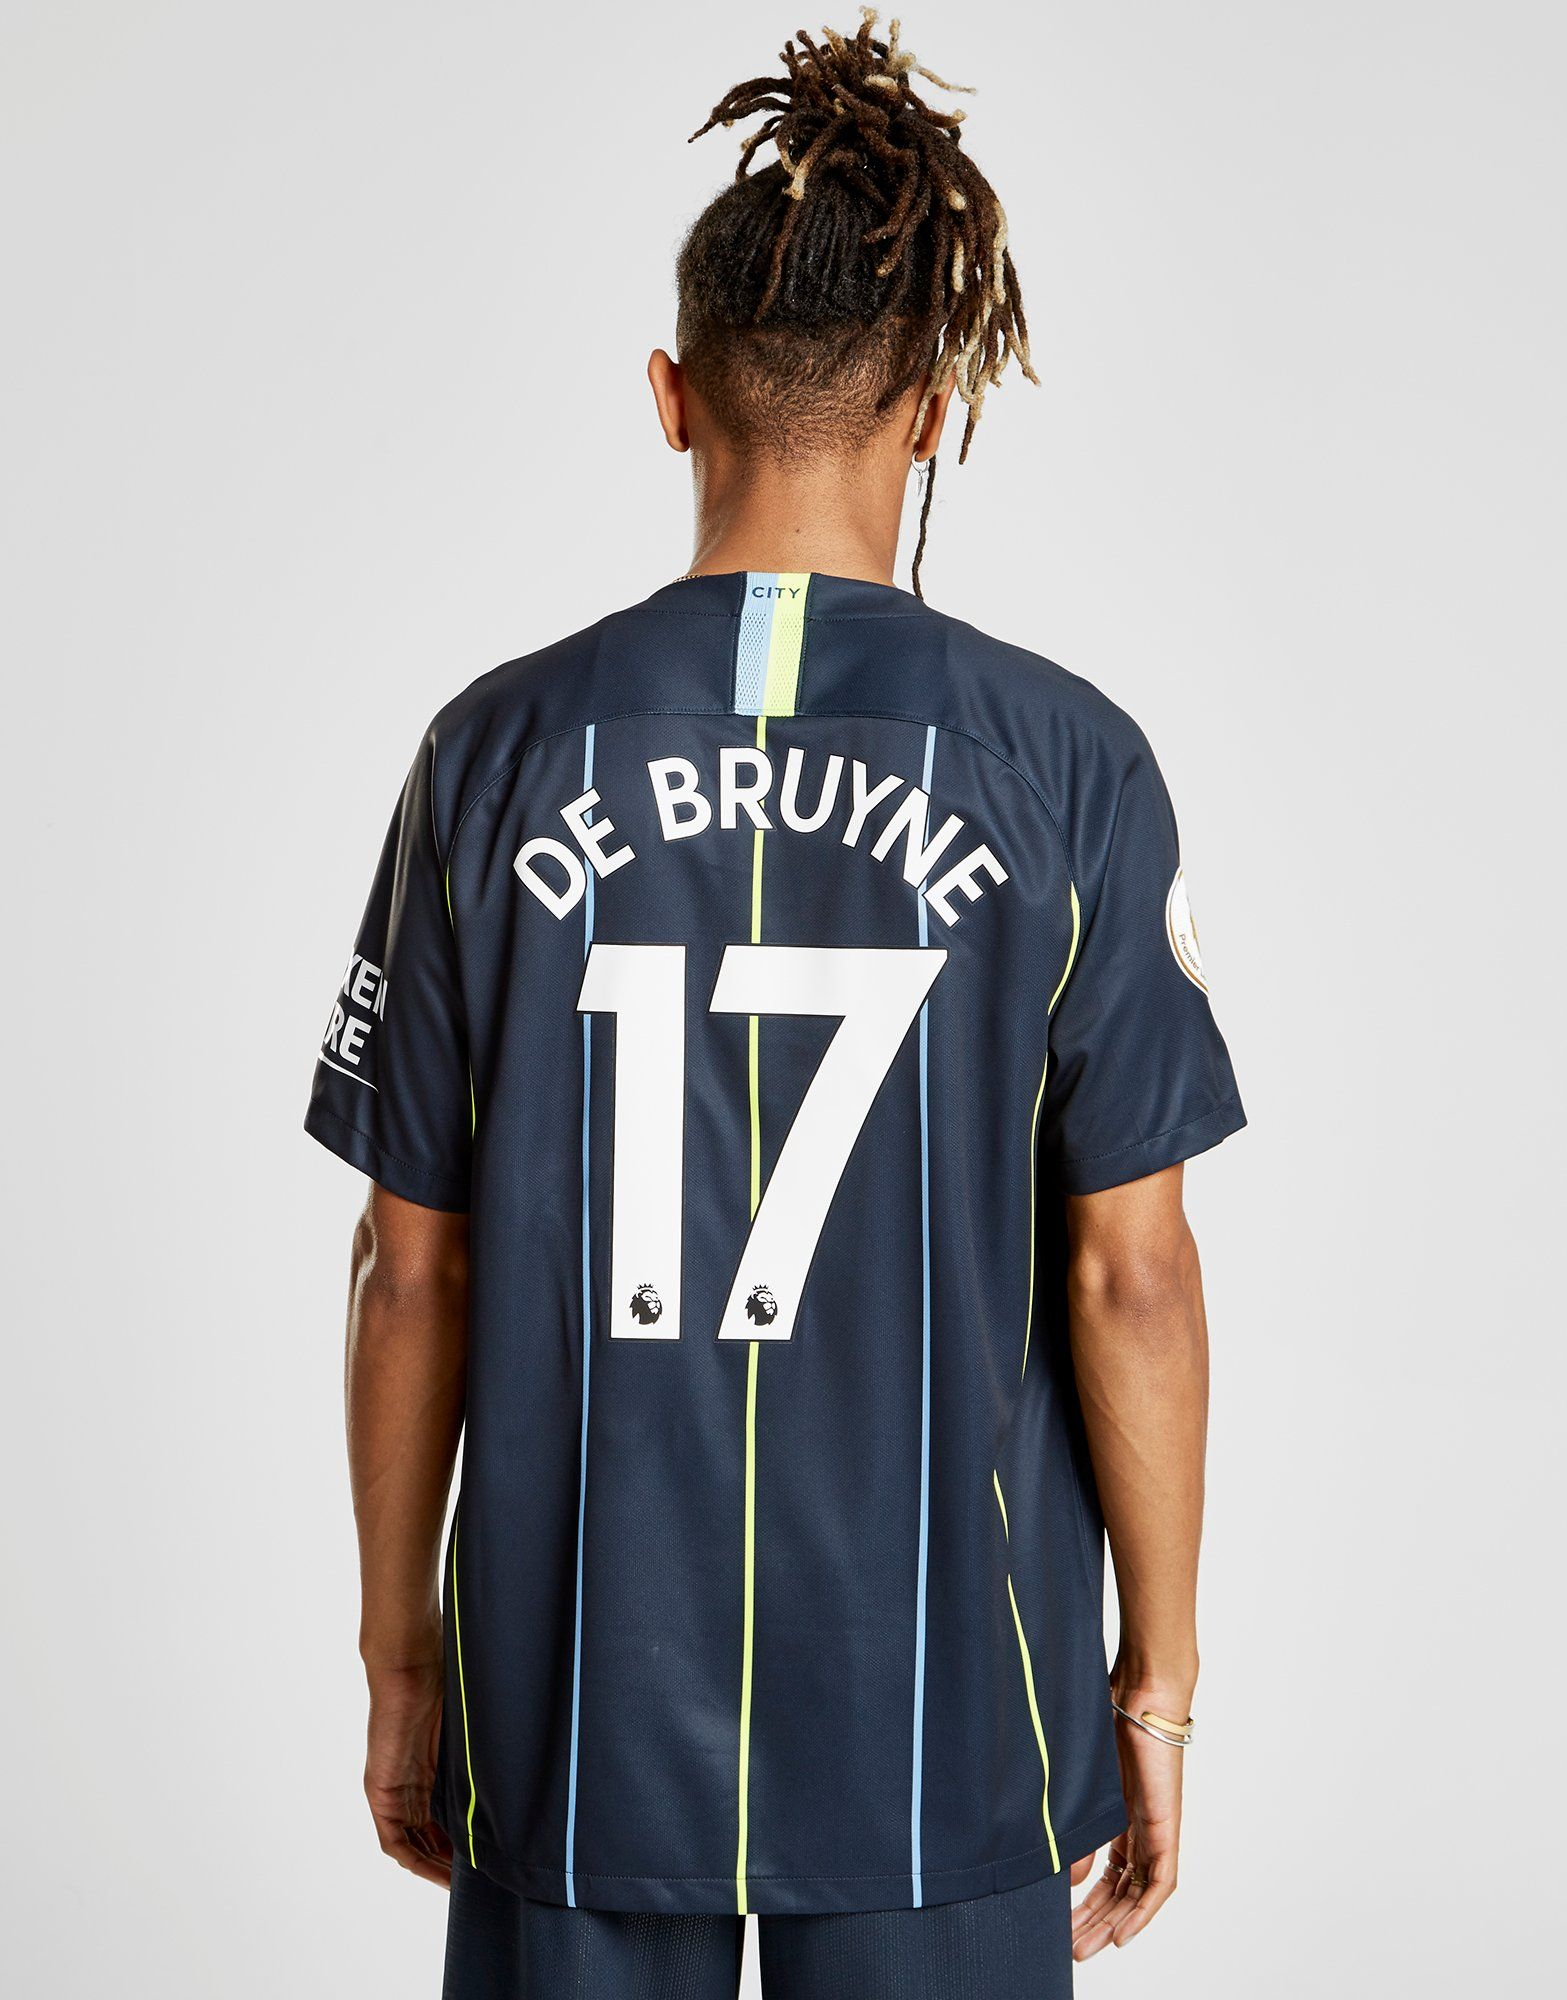 Nike Manchester City 2018/19 De Bruyne #17 Away Shirt